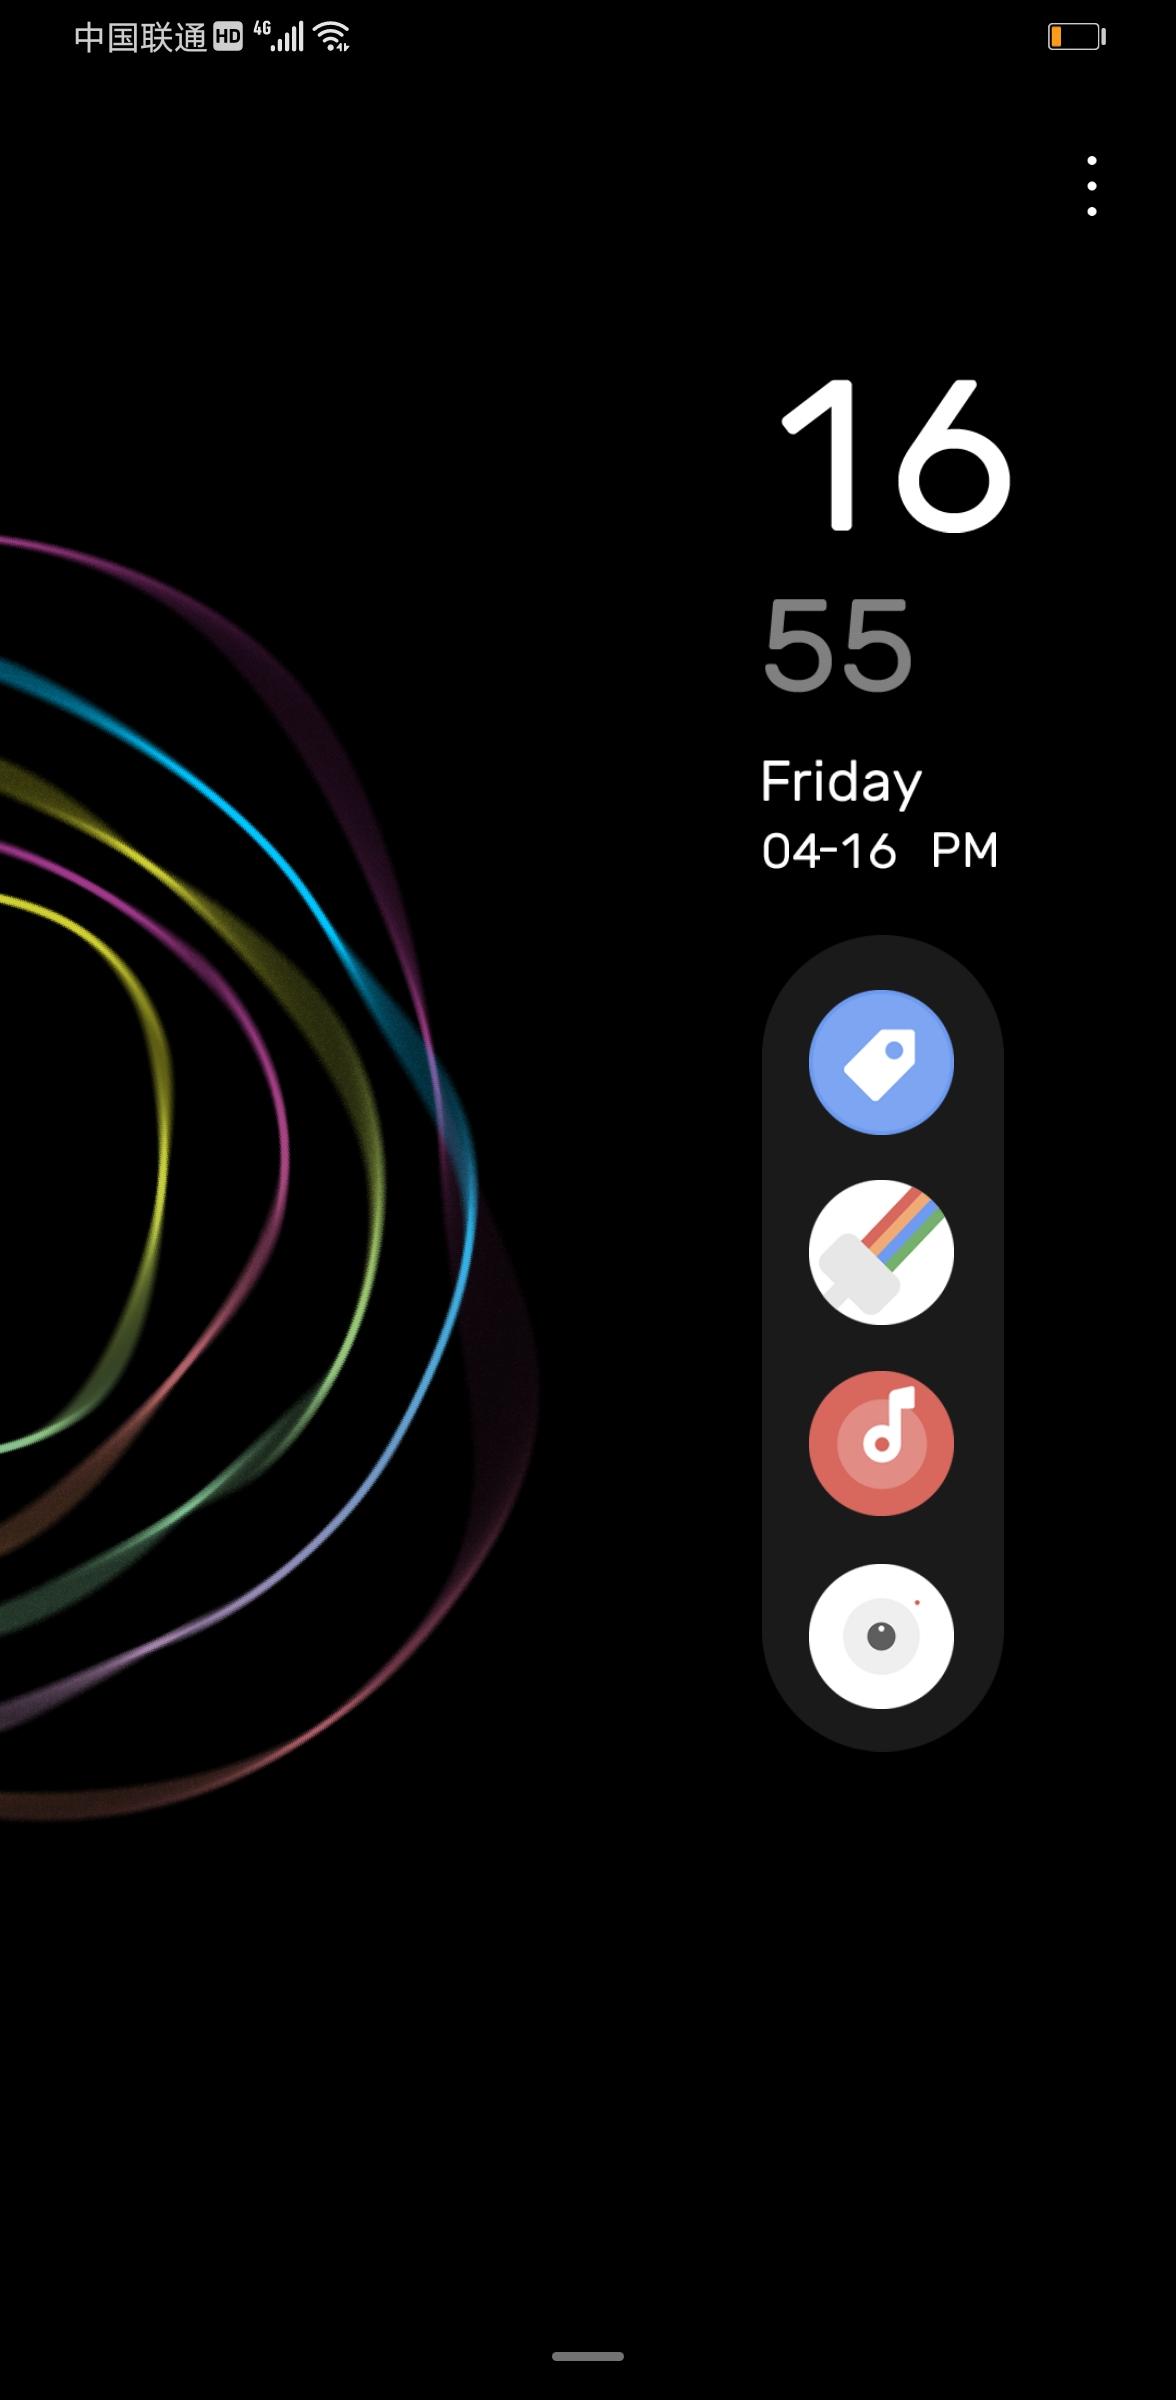 Screenshot_20210416_165537_com.android.keyguard.jpg